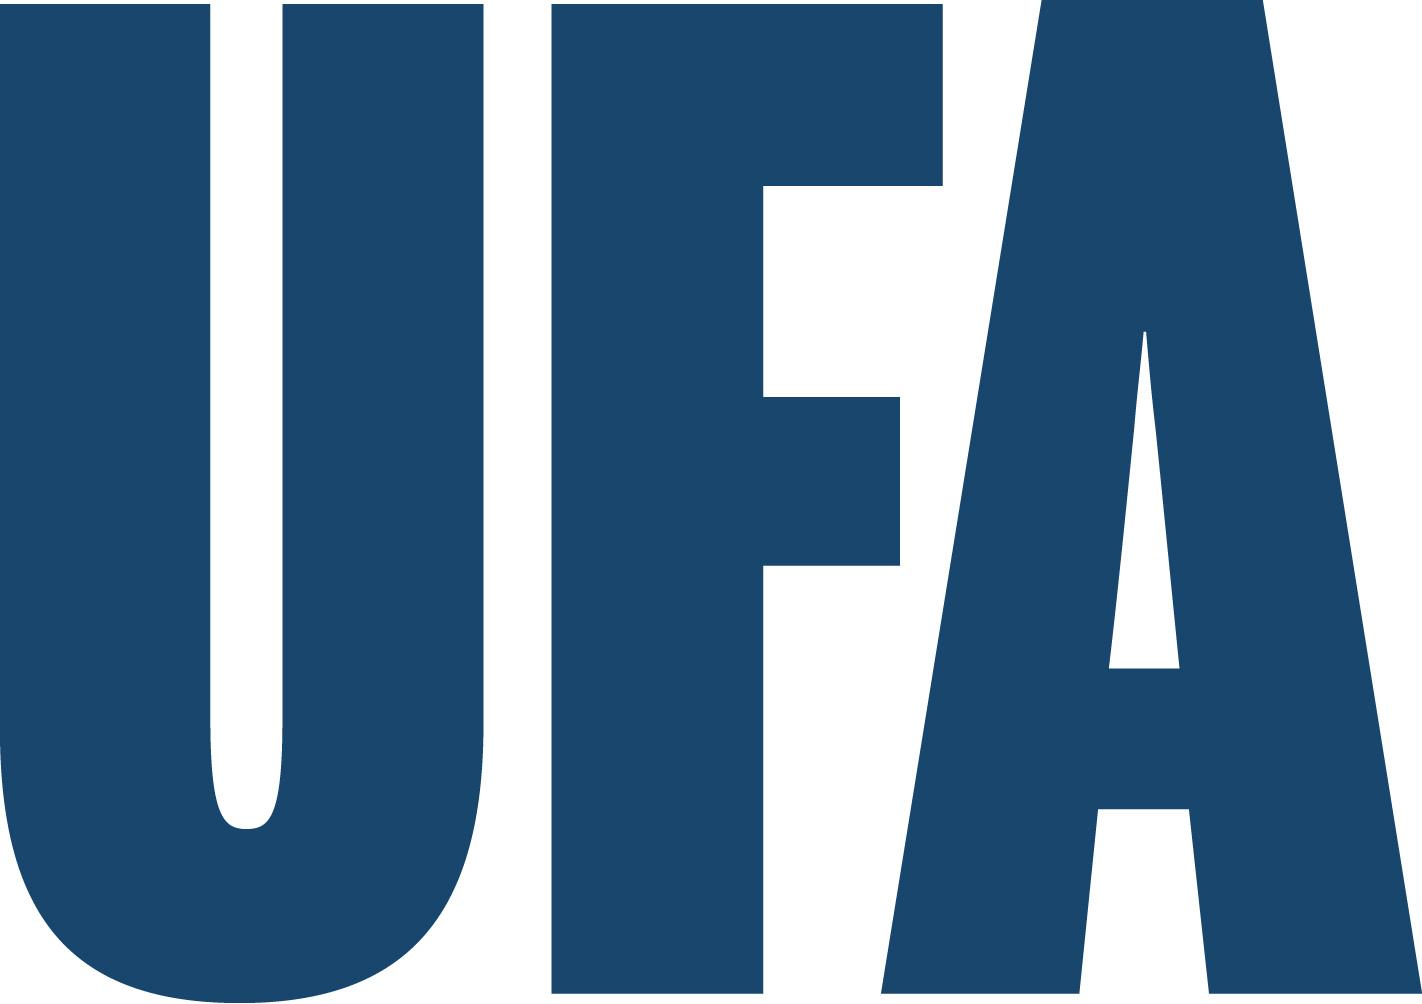 UFA Film- und TV-Produktion Babelsberg